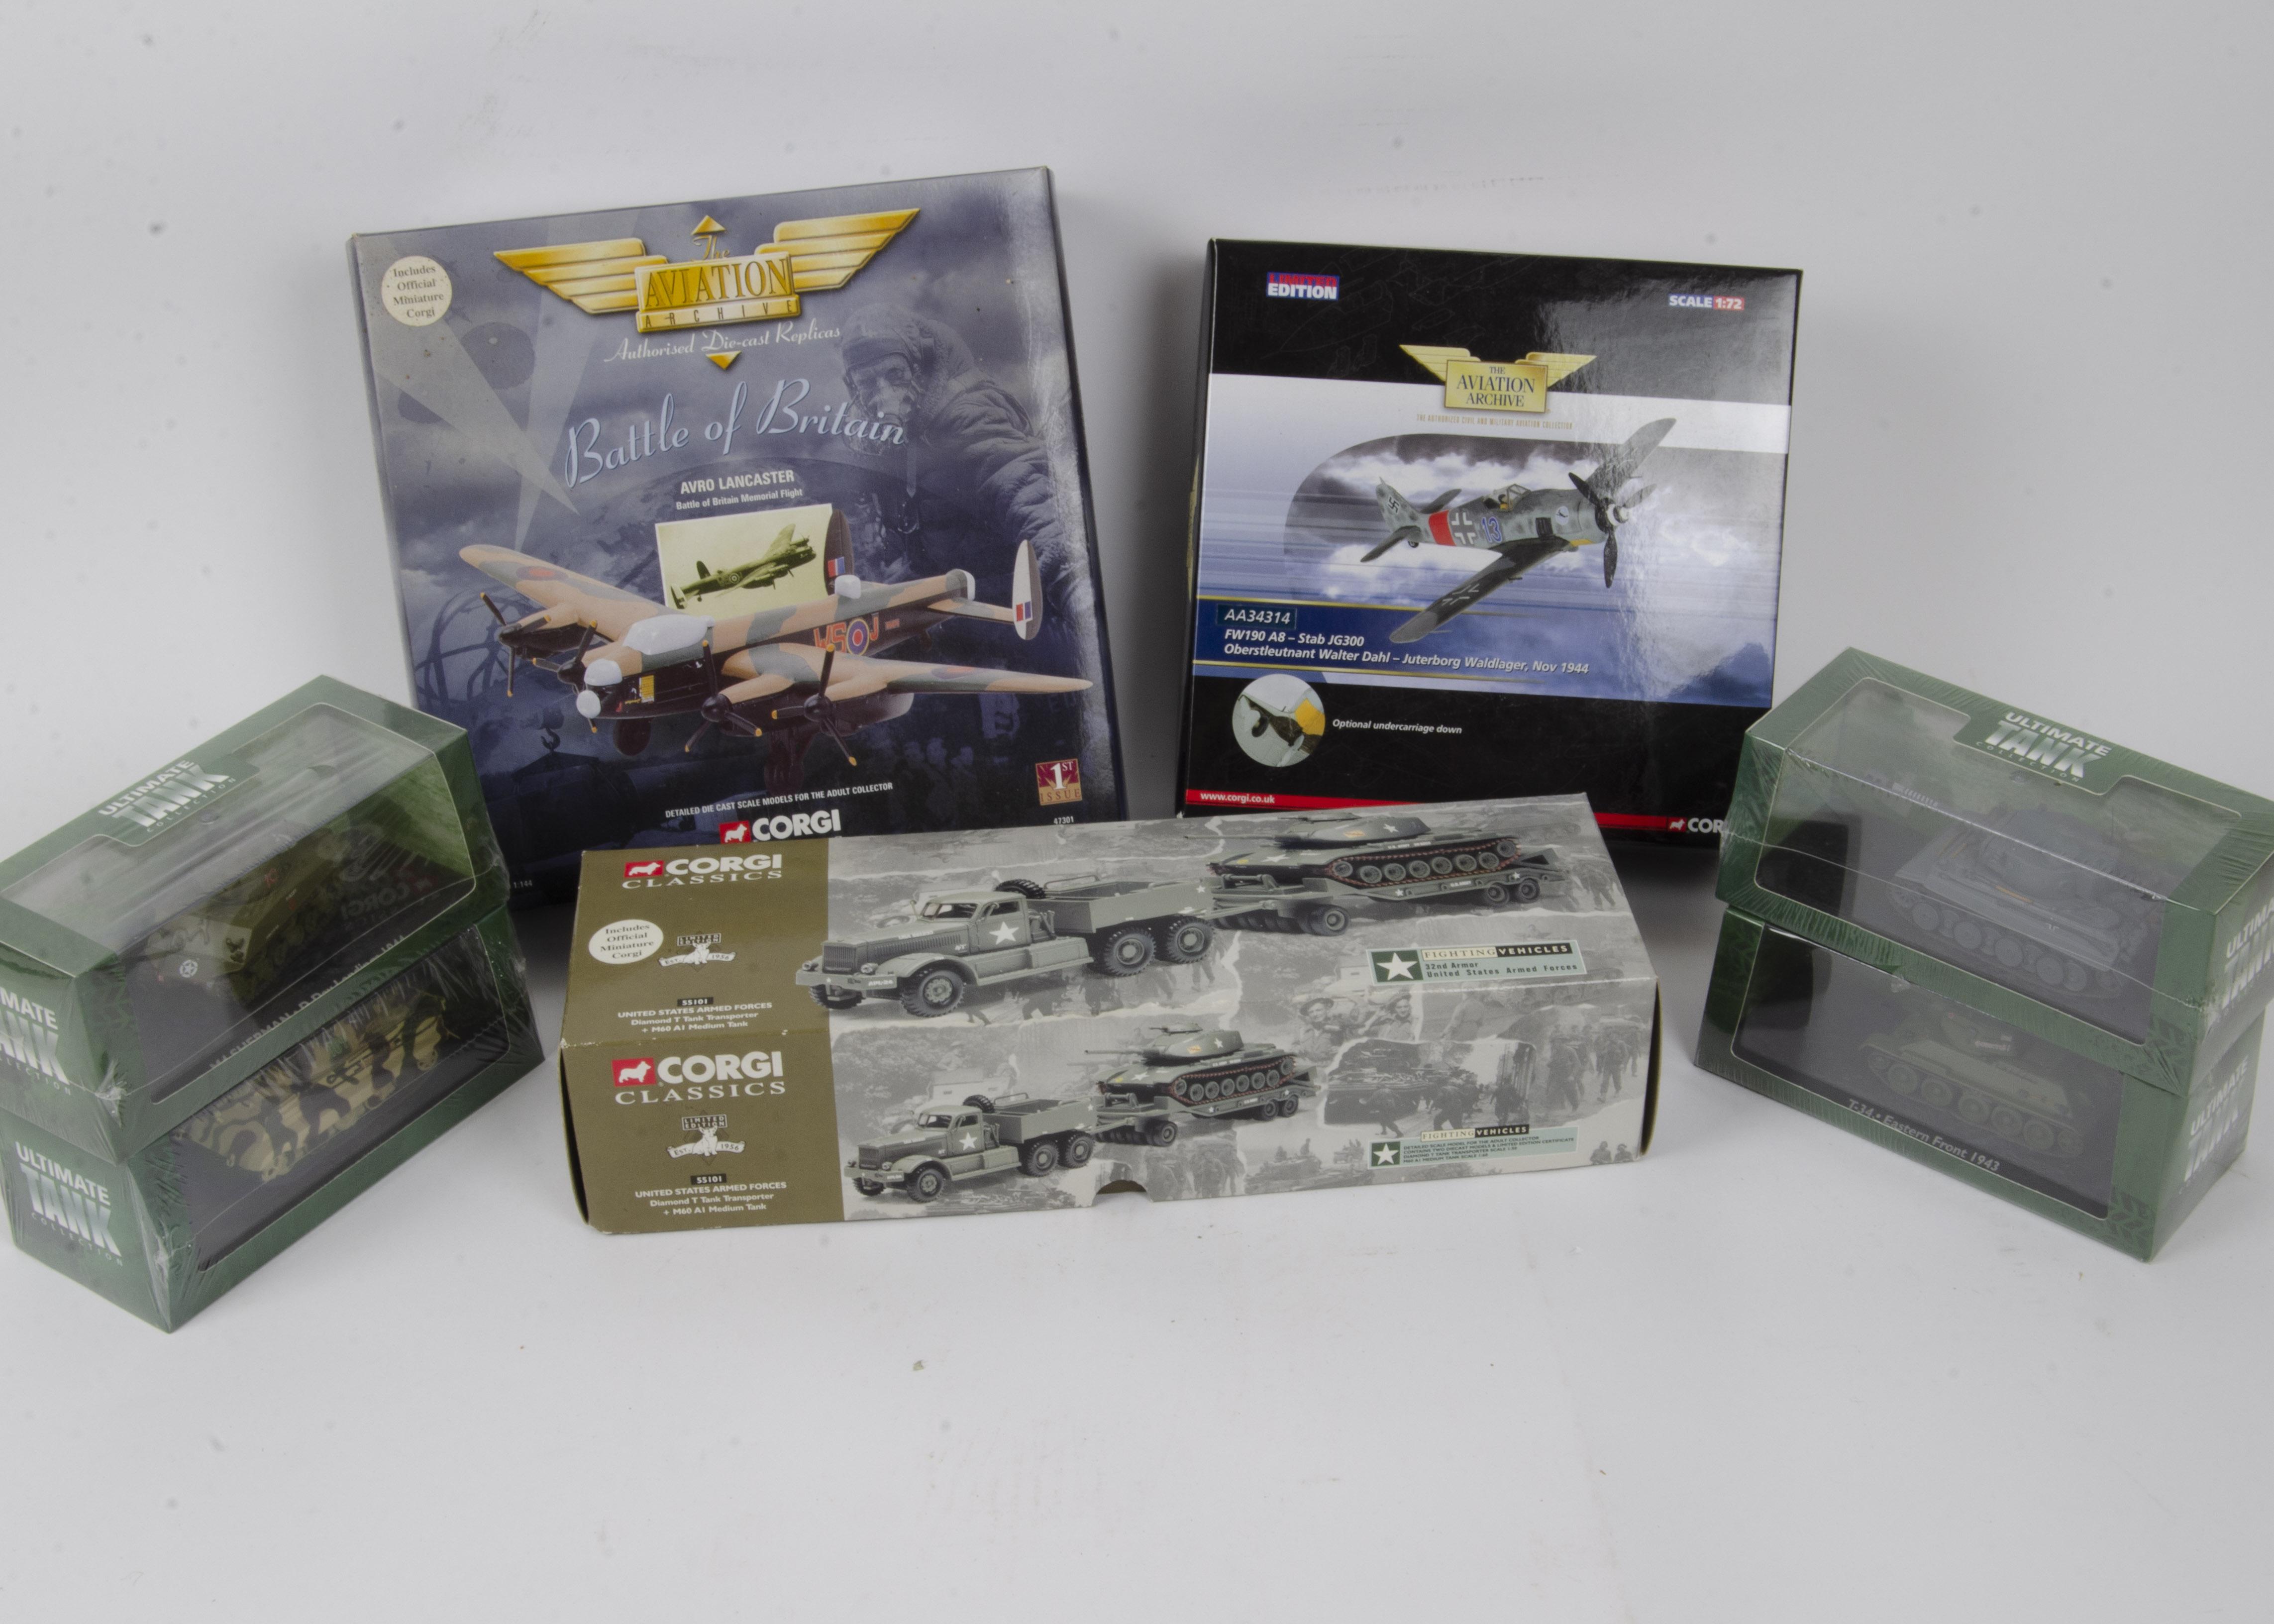 Modern Military Diecast Models, World War II era vehicles some limited edition including Corgi